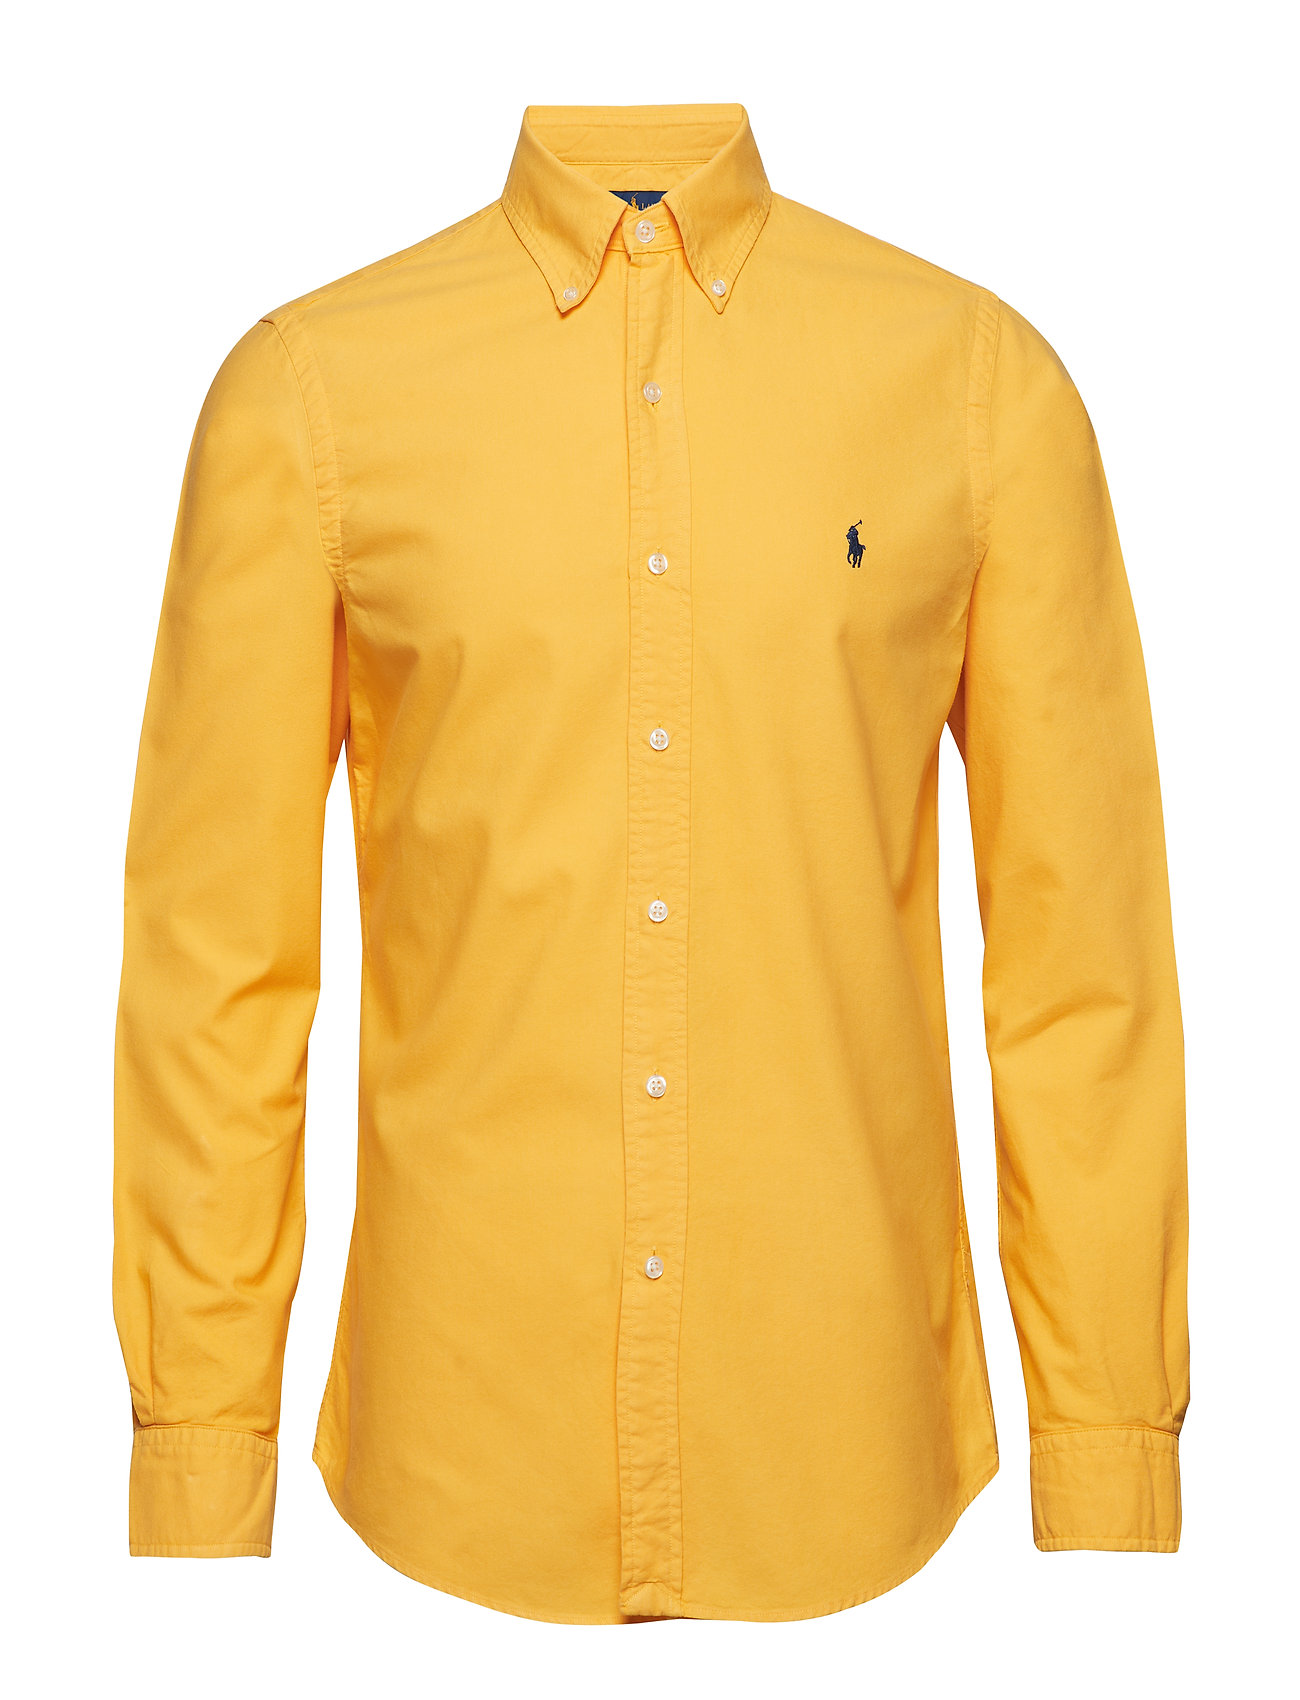 Polo Ralph Lauren Slim Fit Cotton Oxford Shirt - GOLD BUGLE